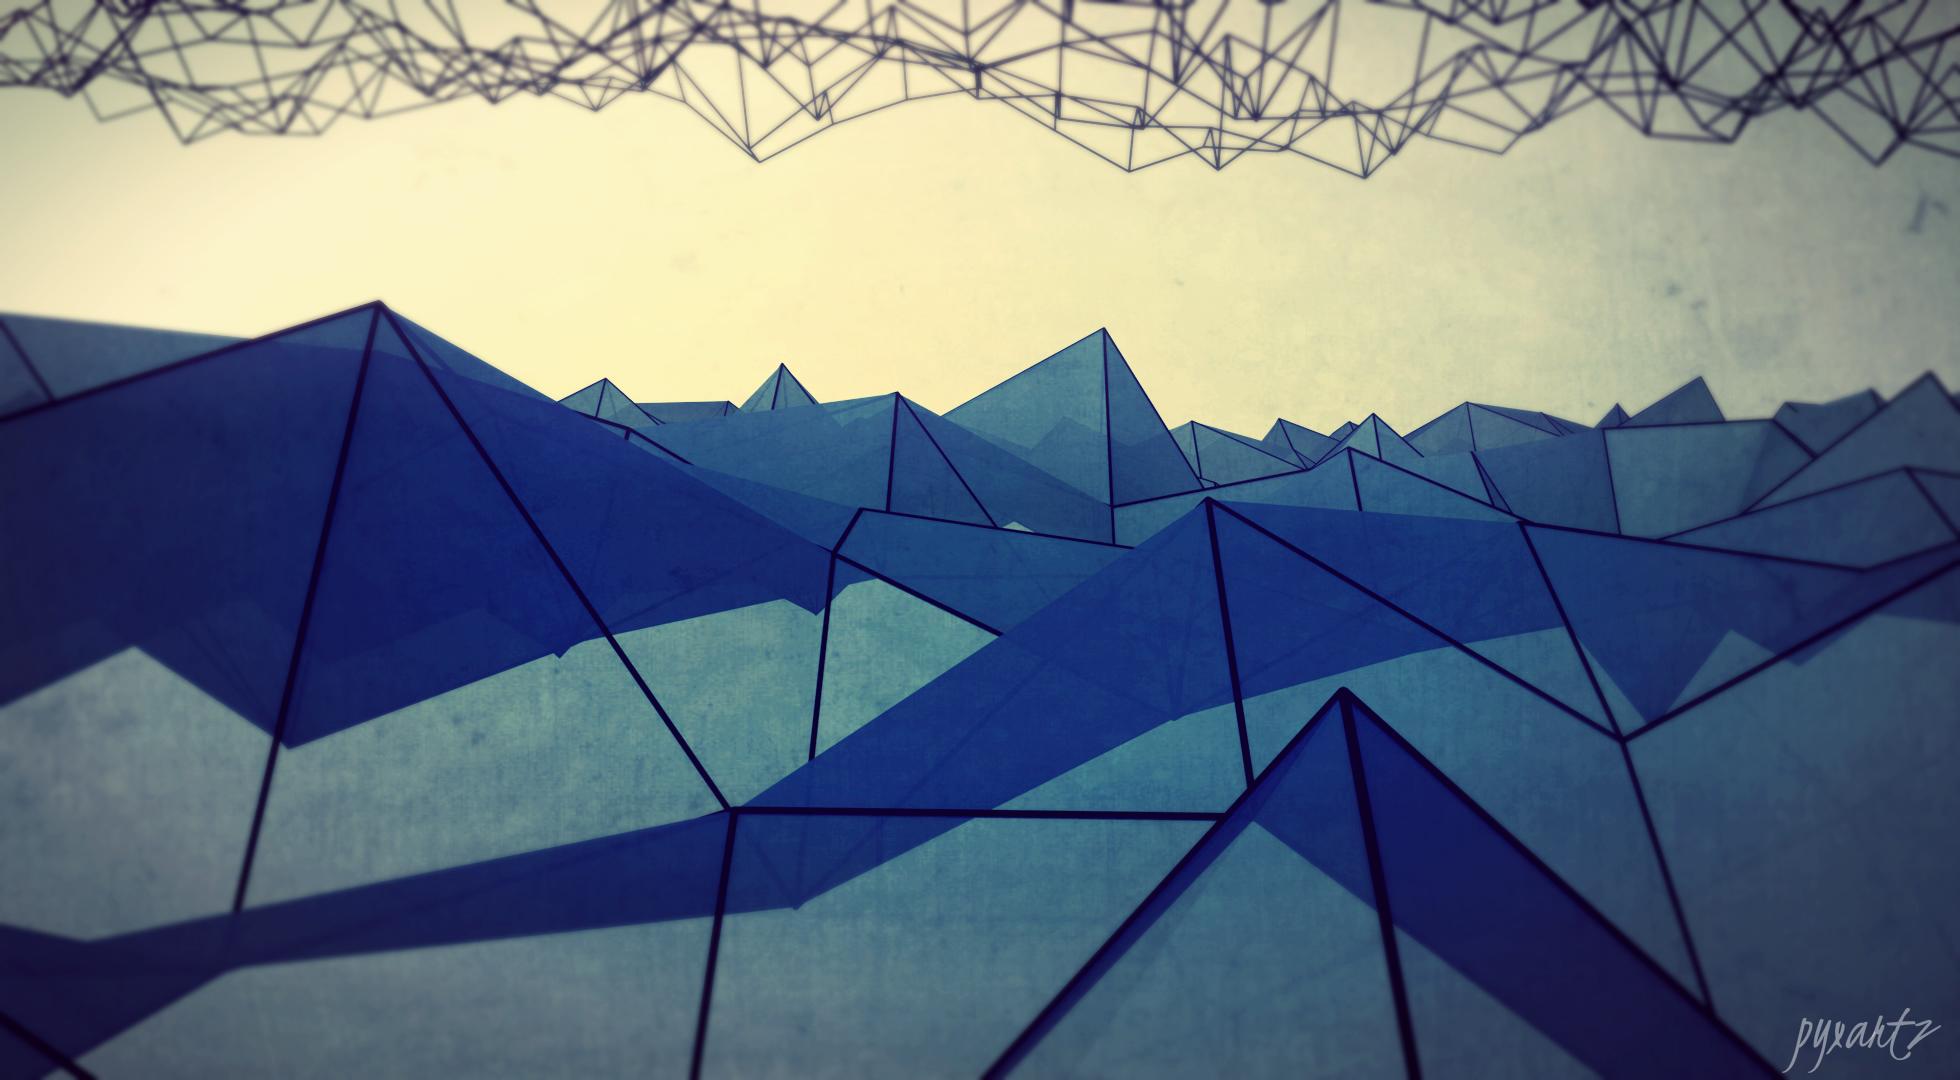 HD Polygon Wallpapers - WallpaperSafari